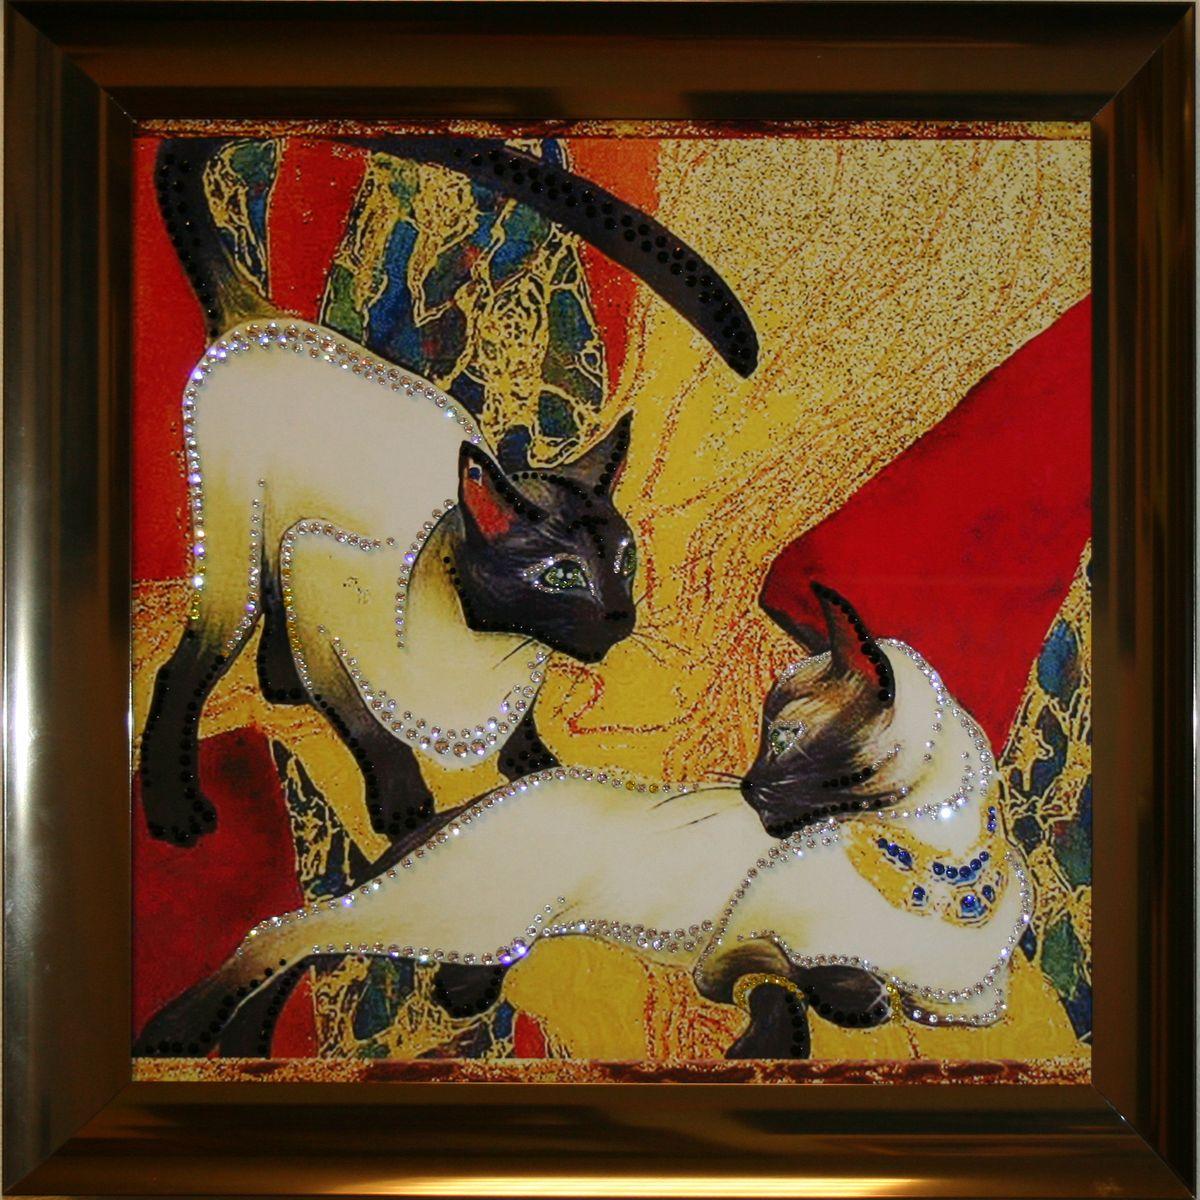 1487 Картина Сваровски Кошки1487стекло, хрусталь, алюминий. 48х48